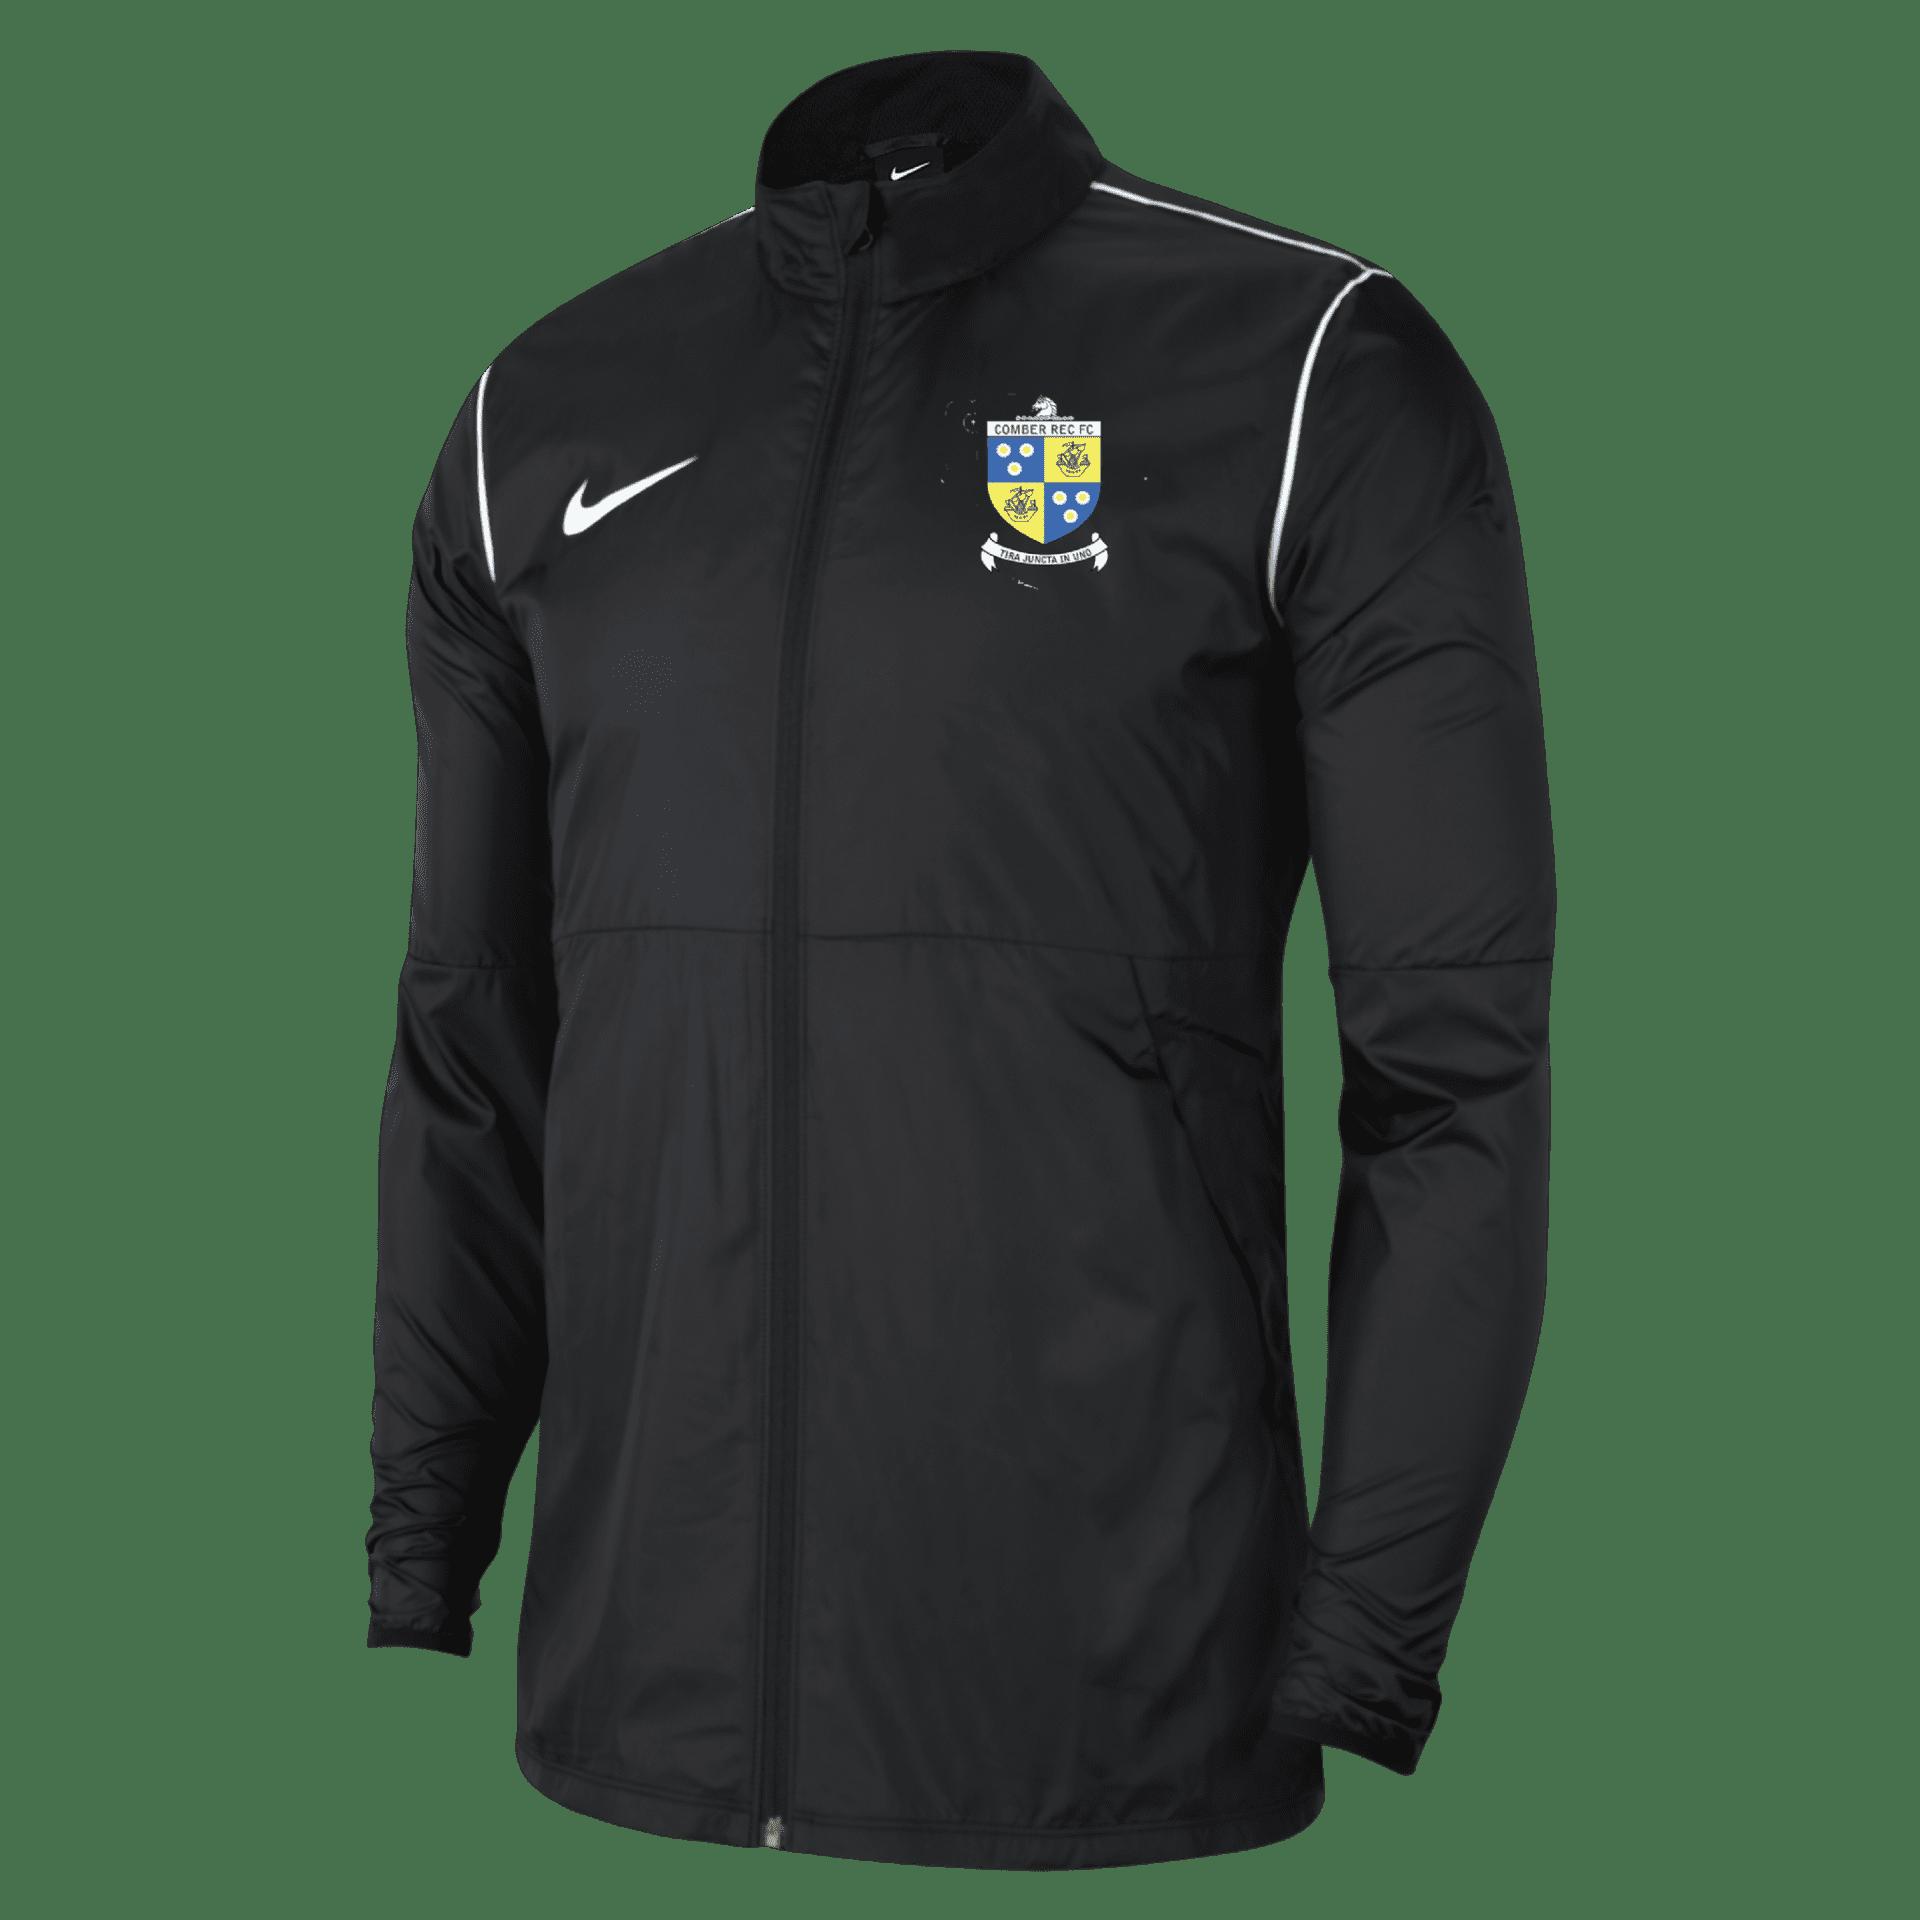 comber rec ladies park 20 rain jacket 31095 1 p